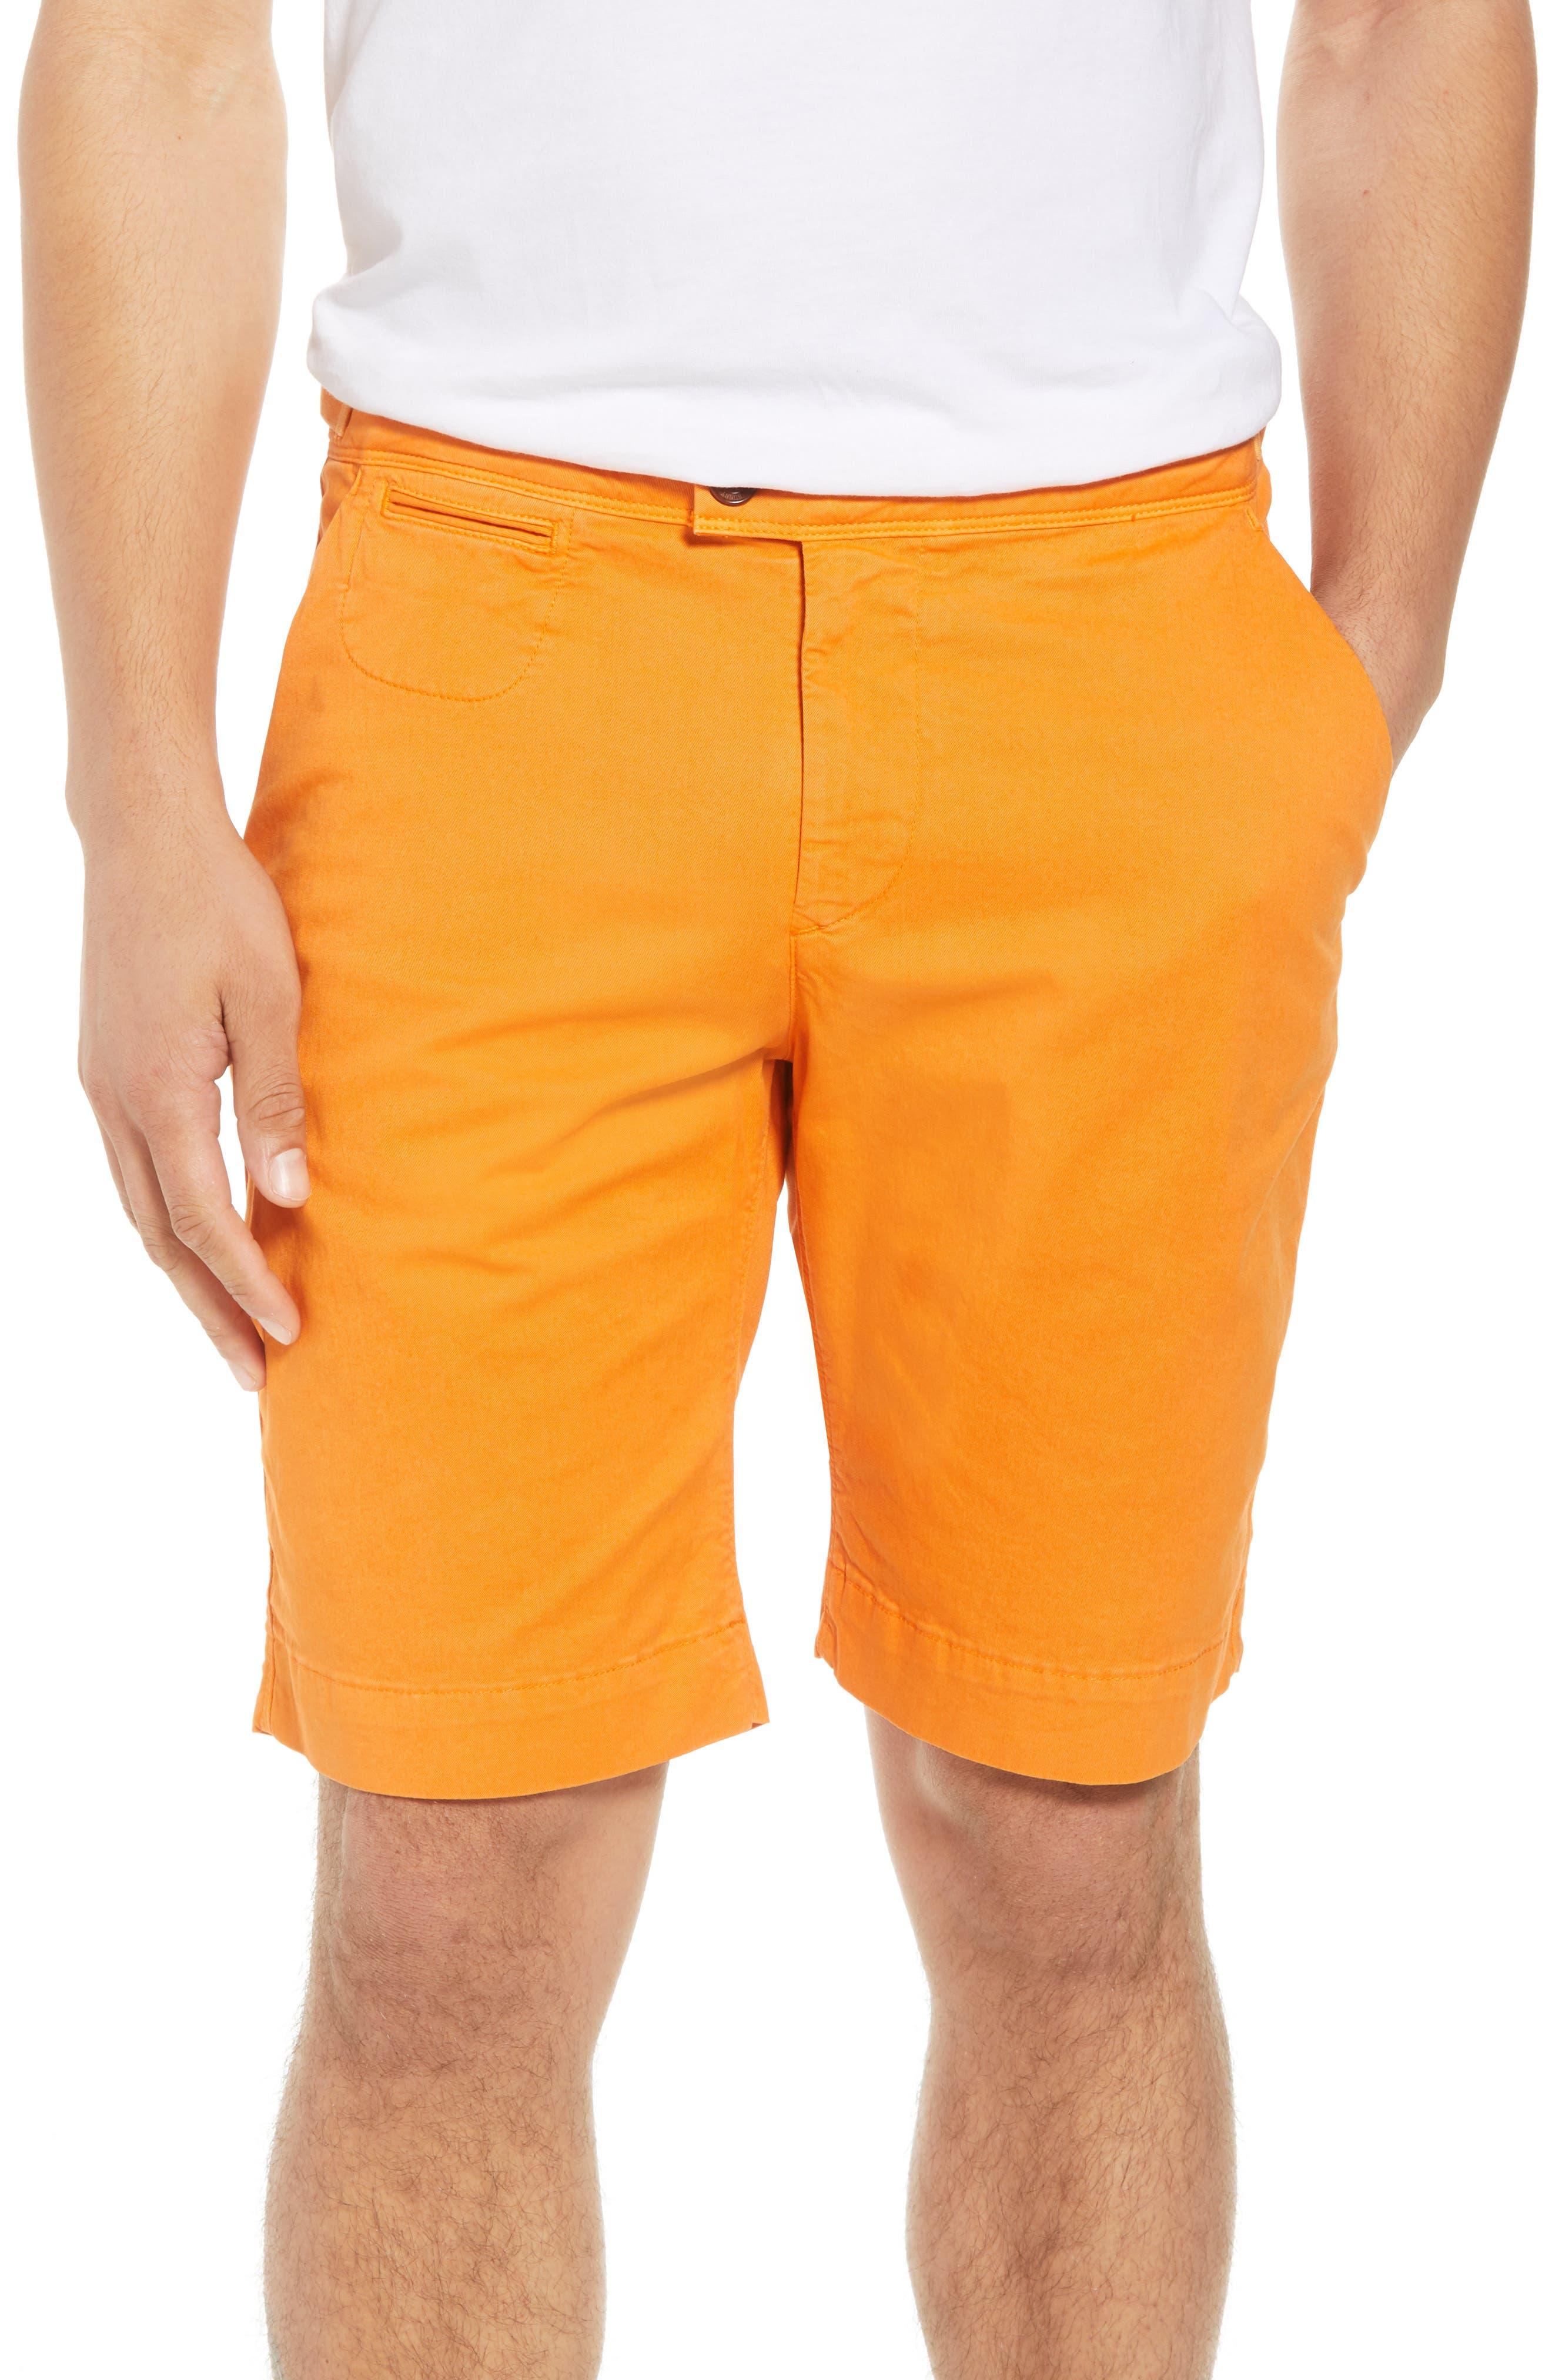 Triumph Shorts,                             Main thumbnail 13, color,